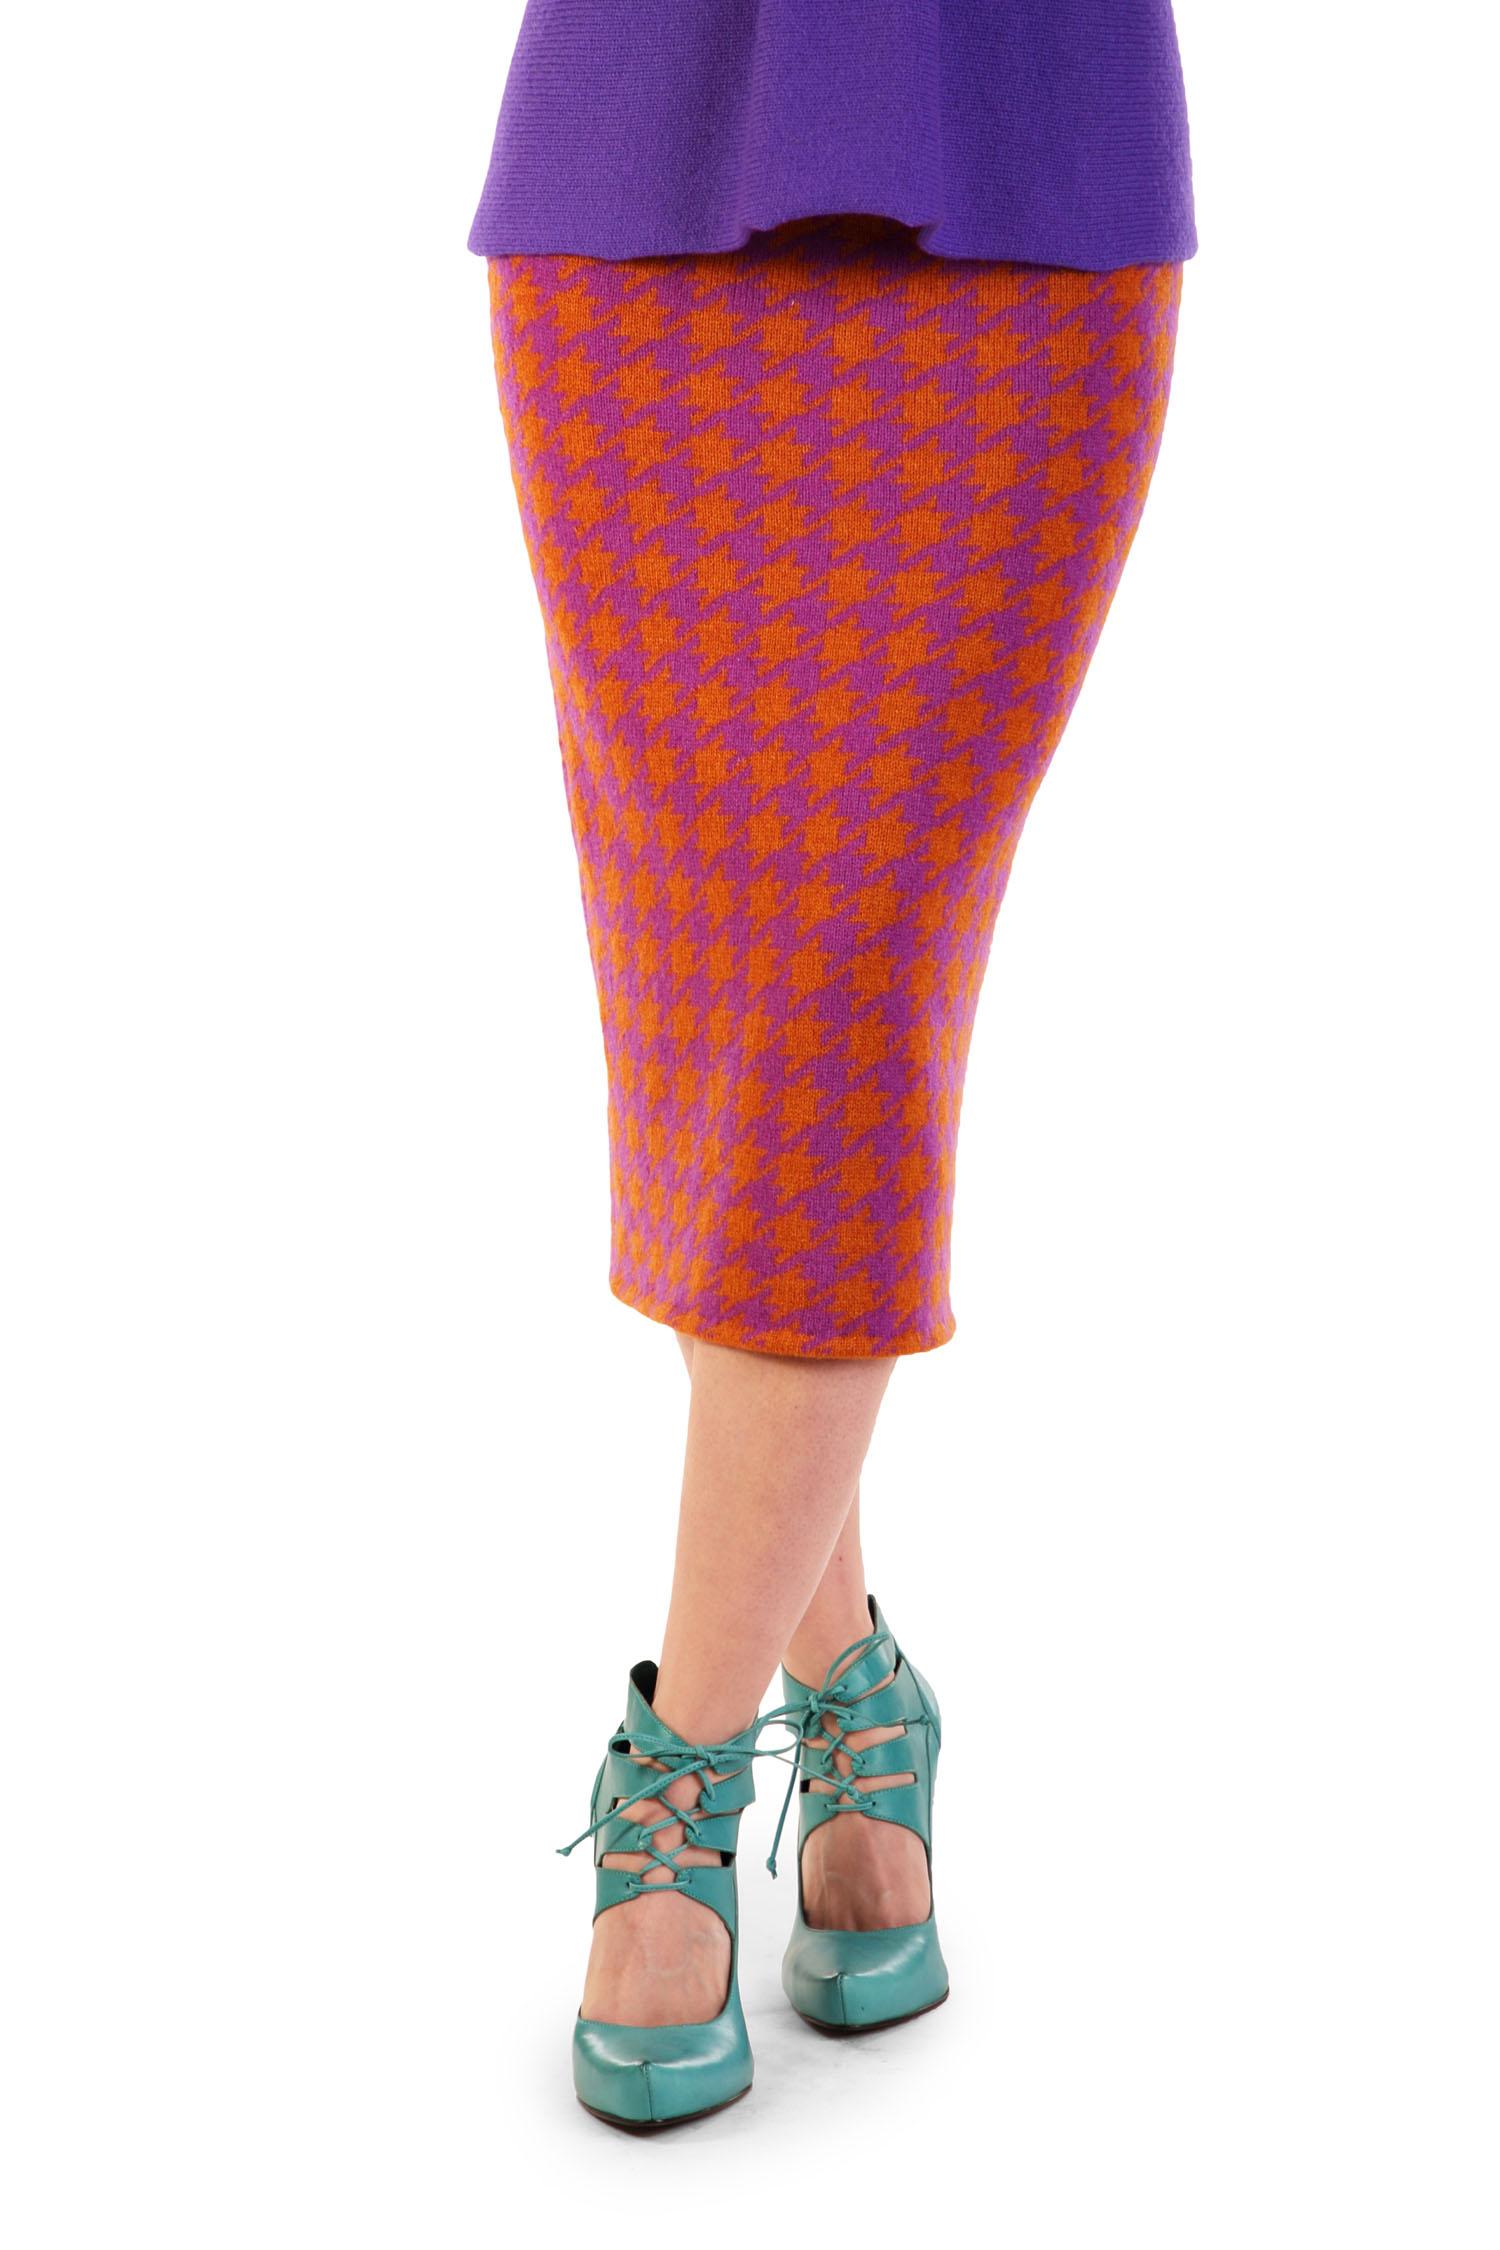 Dogtooth pencil skirt1